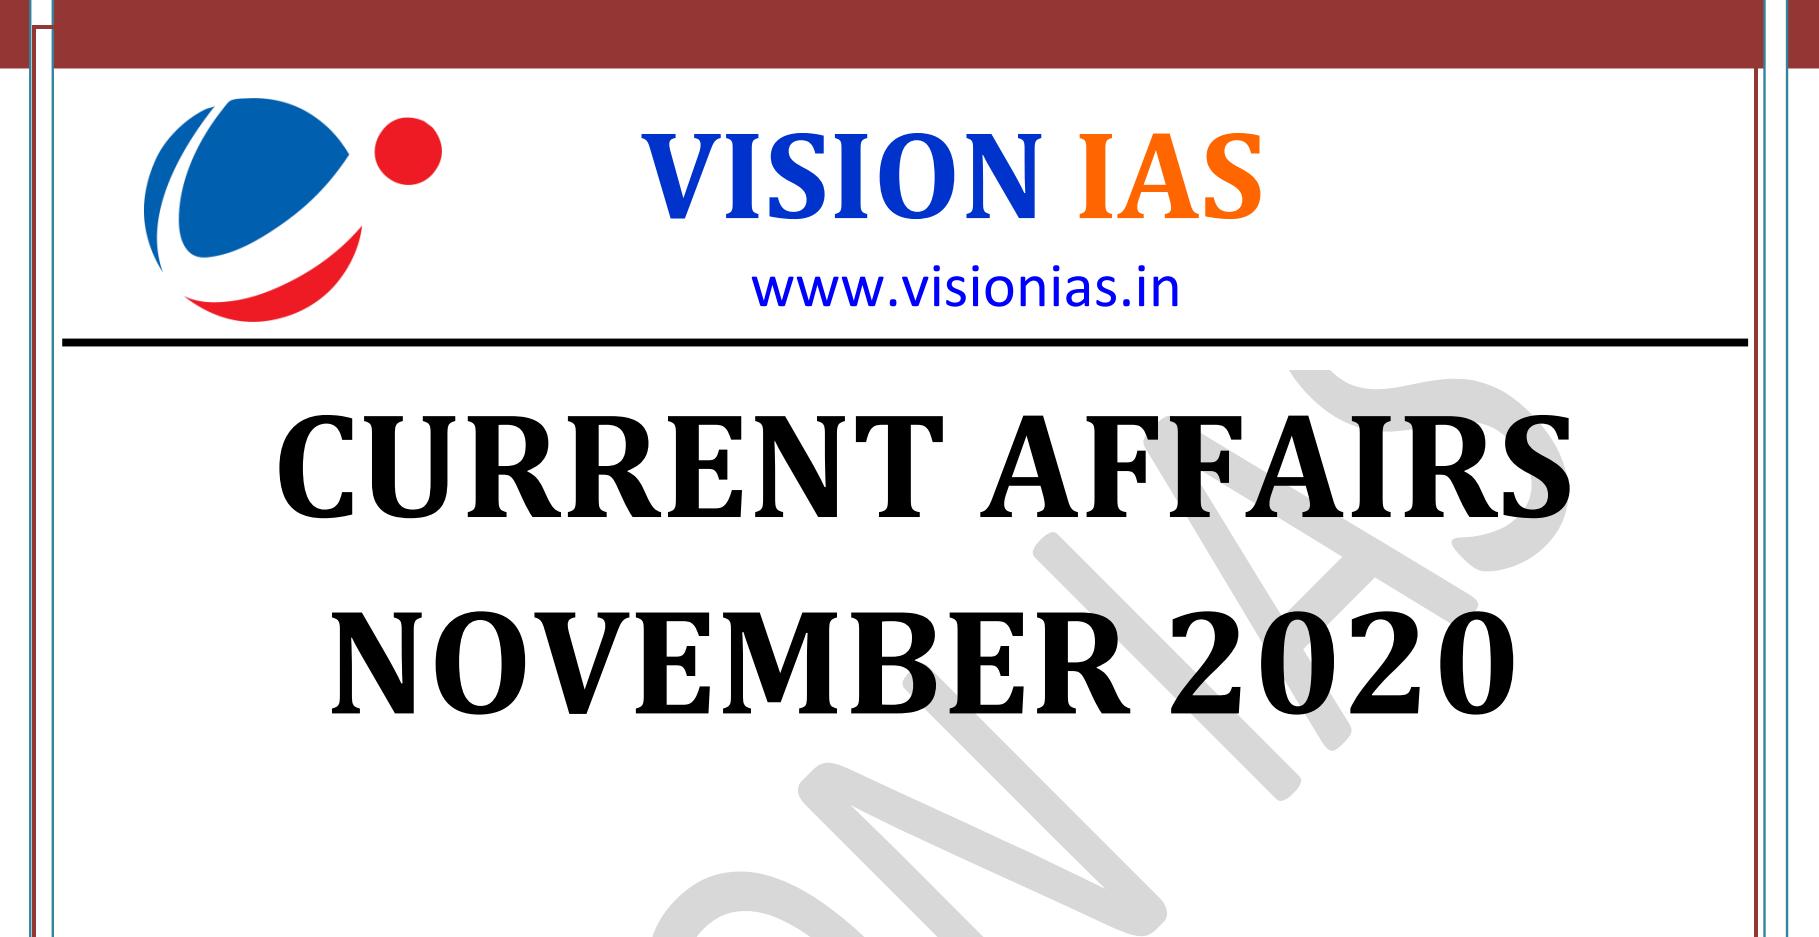 Vision IAS Current Affairs November 2020 pdf